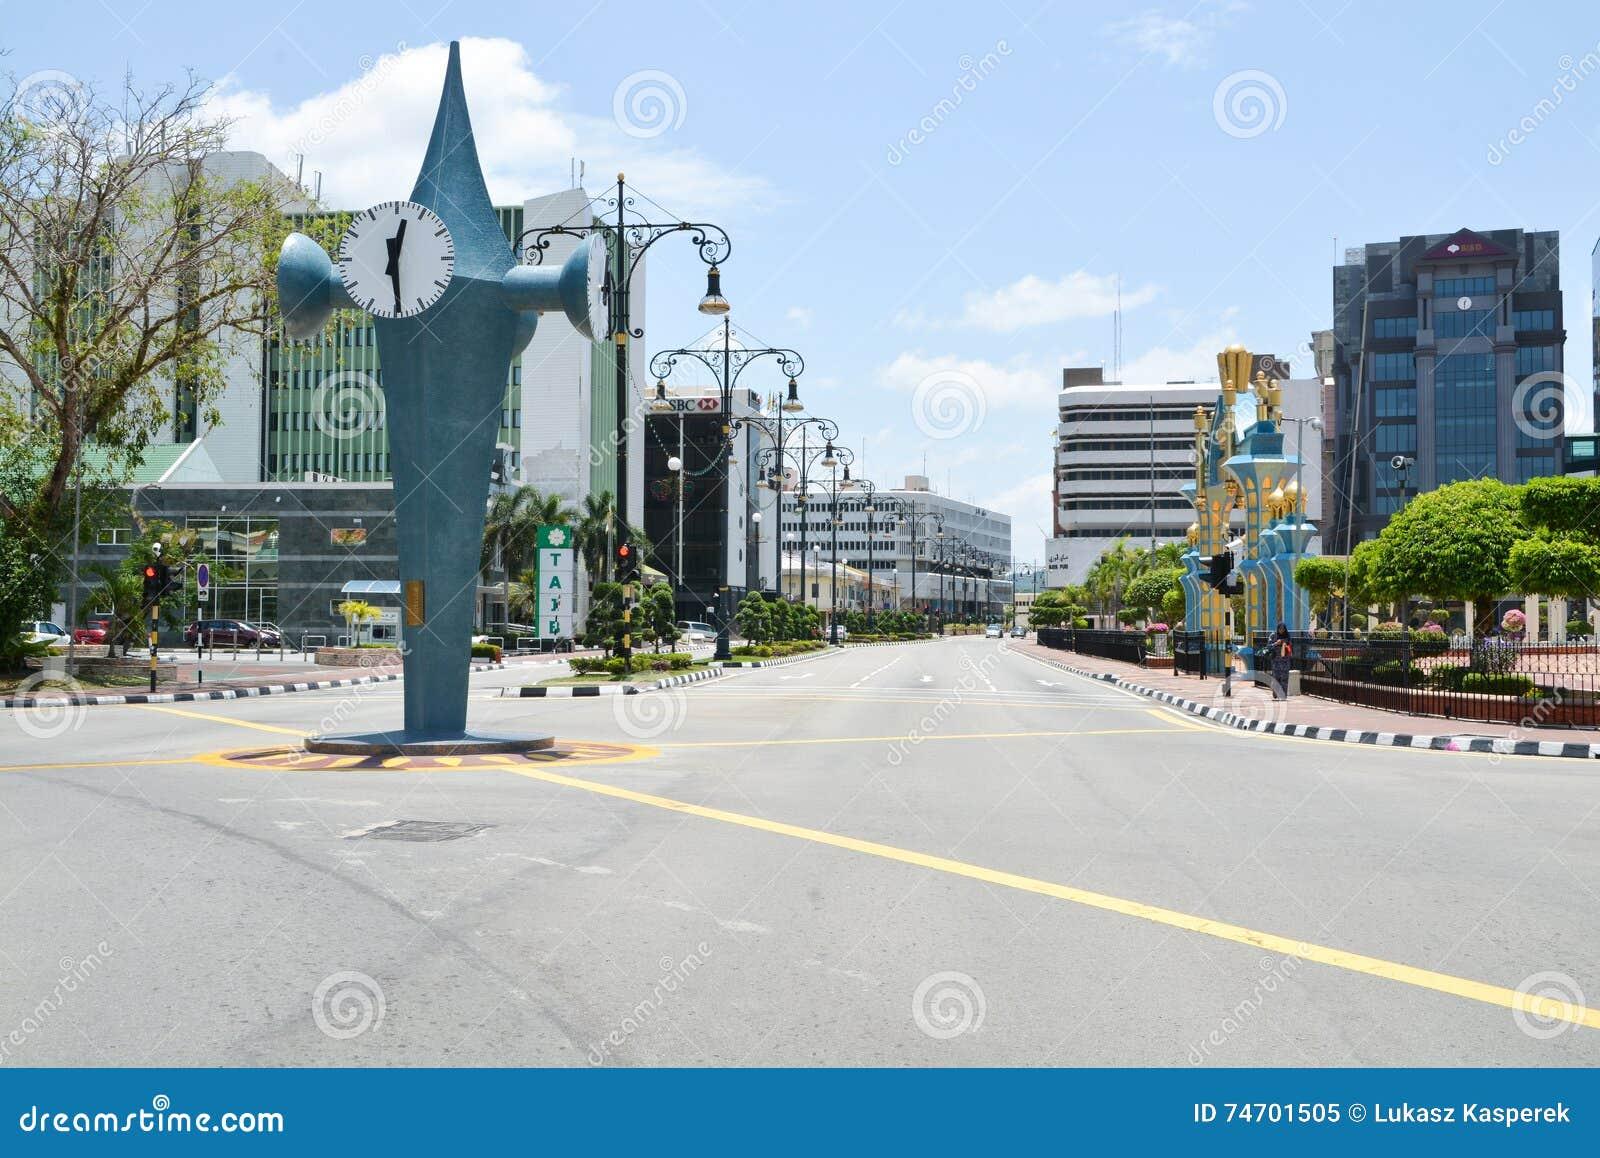 Empty Streets Of Bandar Seri Begawan, Brunei Editorial Image